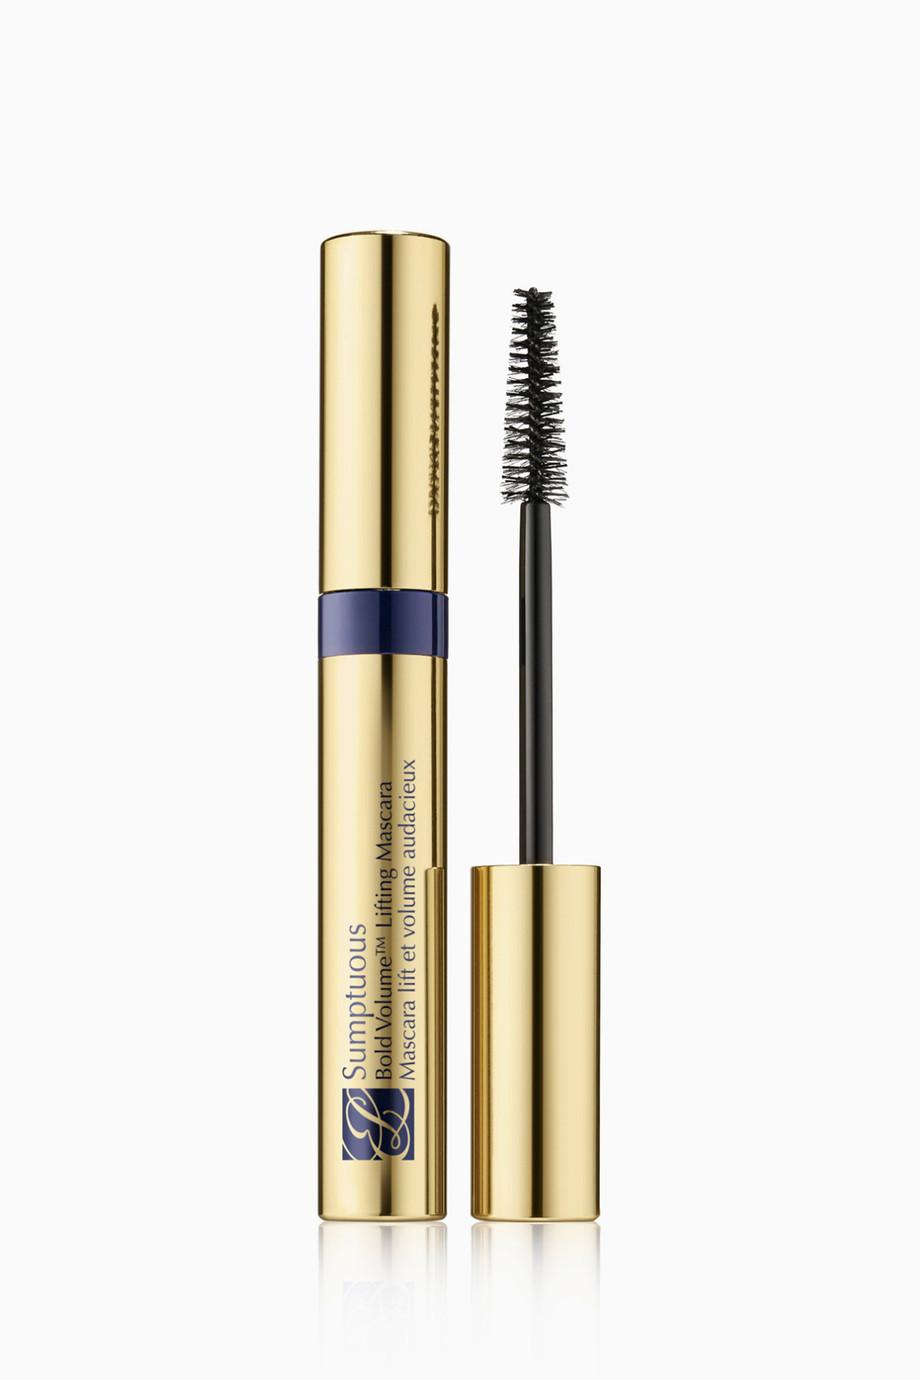 aa9cf2e0c تسوق Sumptuous Bold Volume Lifting Mascara in Black Estée Lauder ملون  للنساء | اُناس